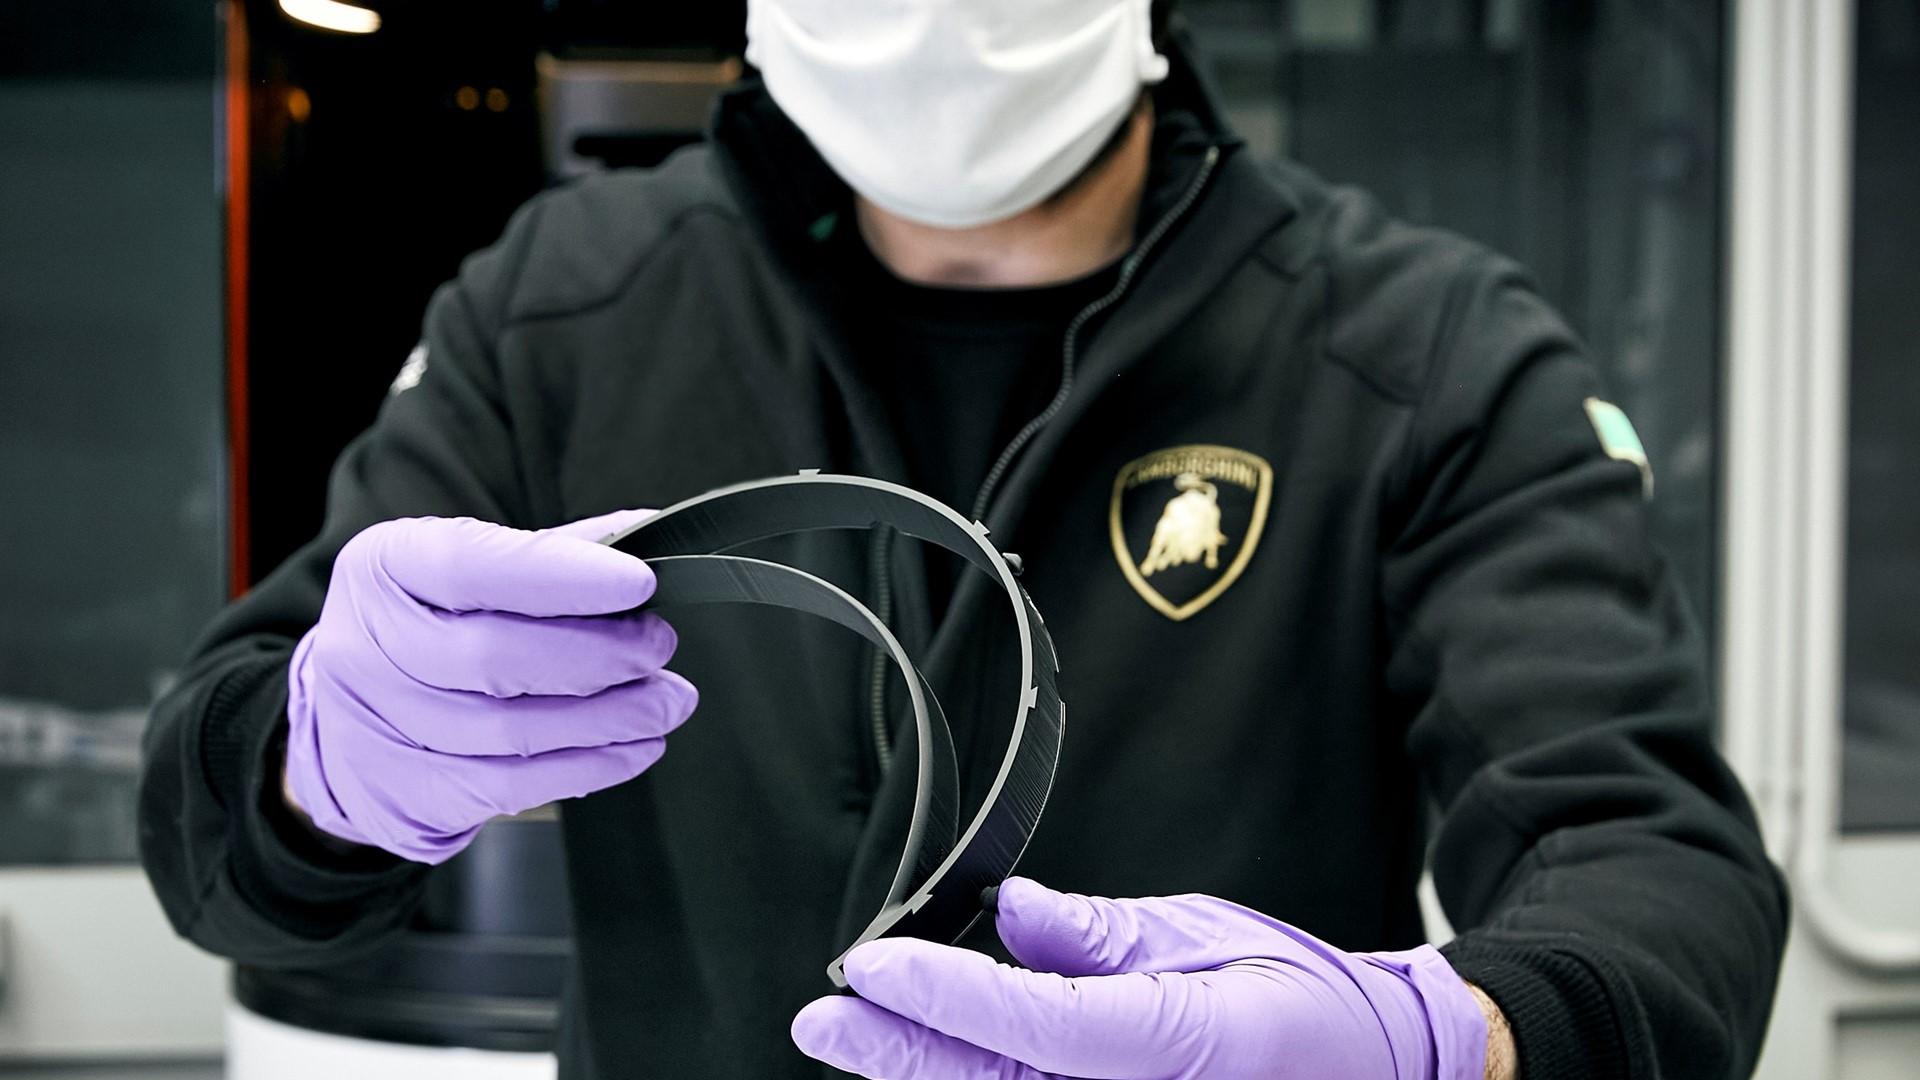 Automobili Lamborghini starts production of surgical masks and medical shields for use in Coronavirus pandemic - Image 3